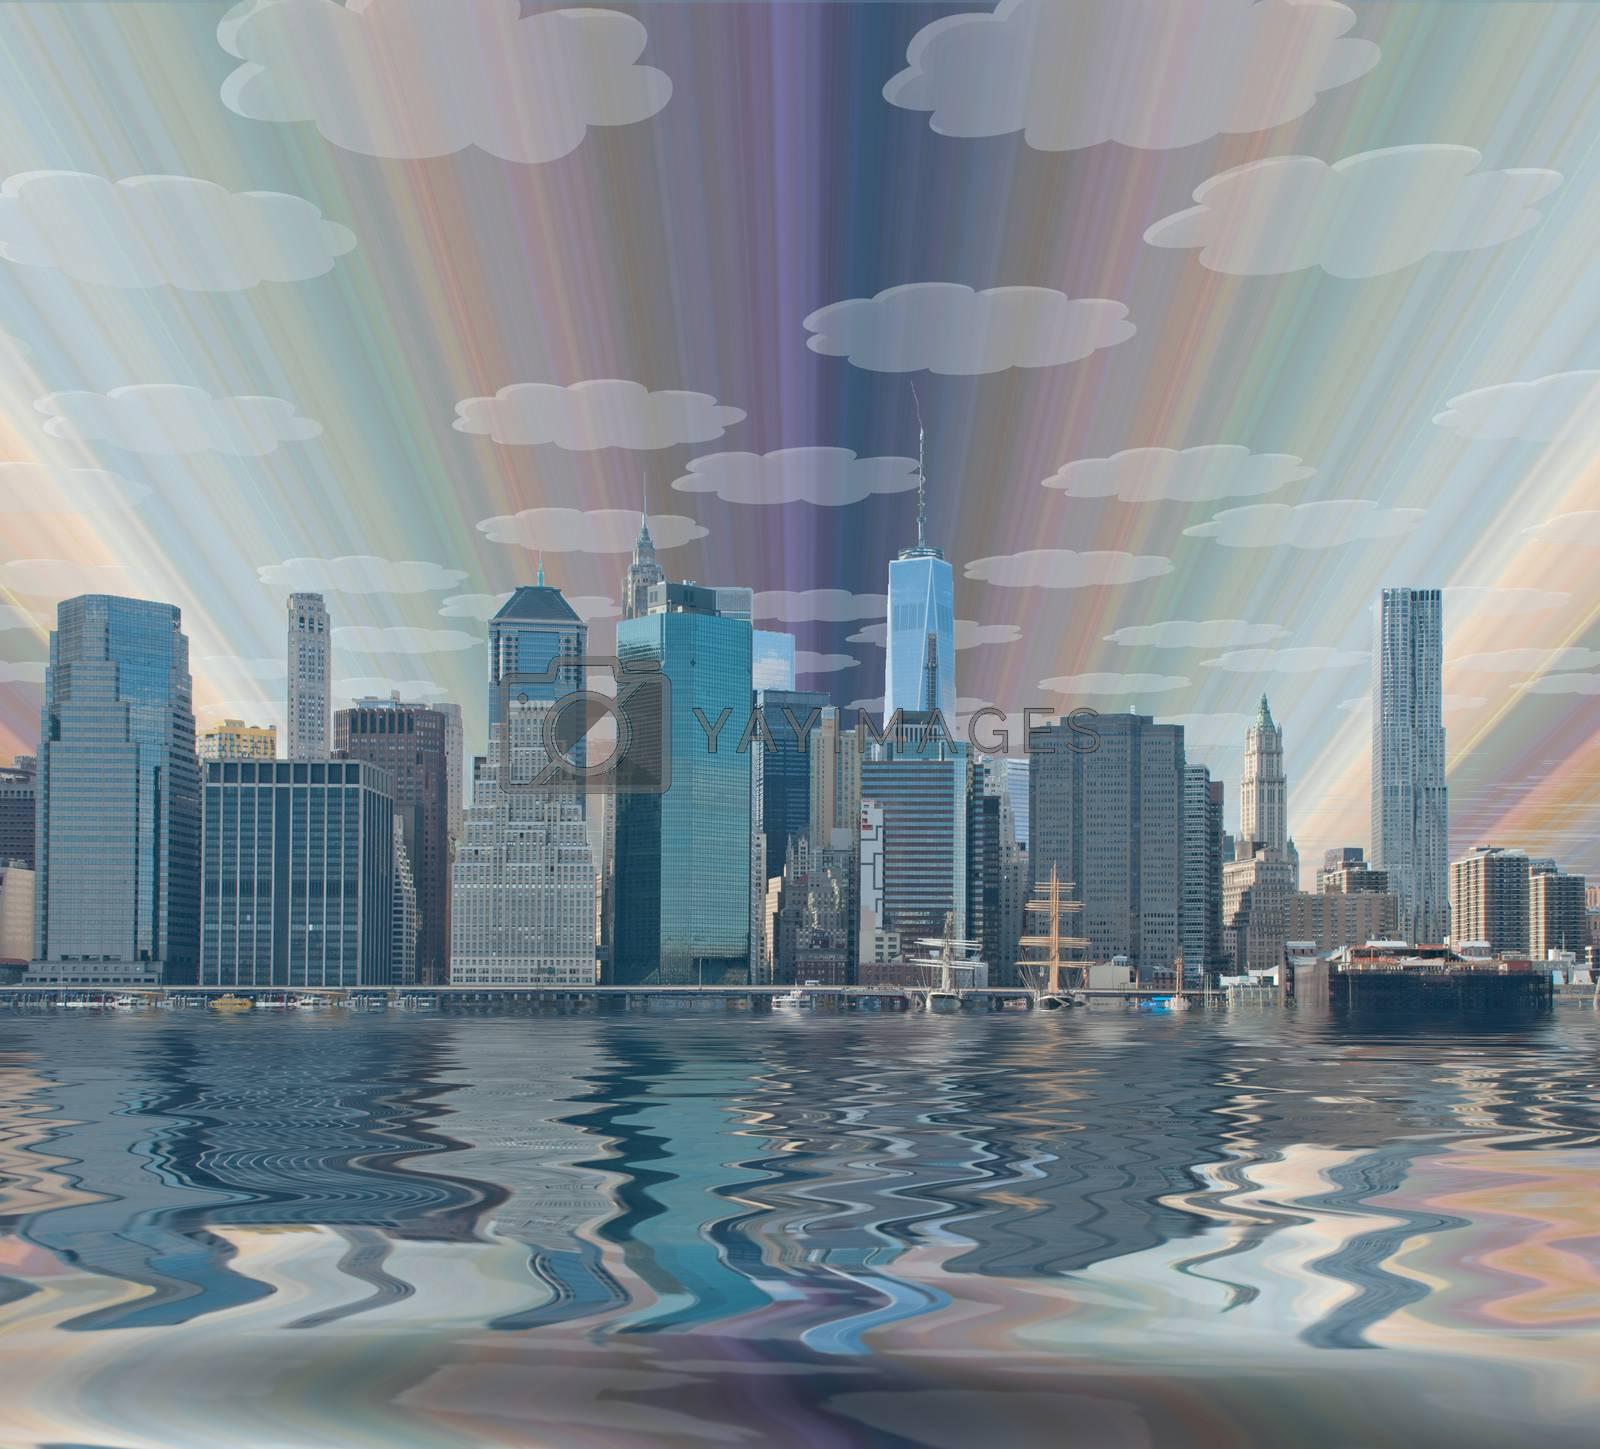 Fantasy New York City. 3D rendering